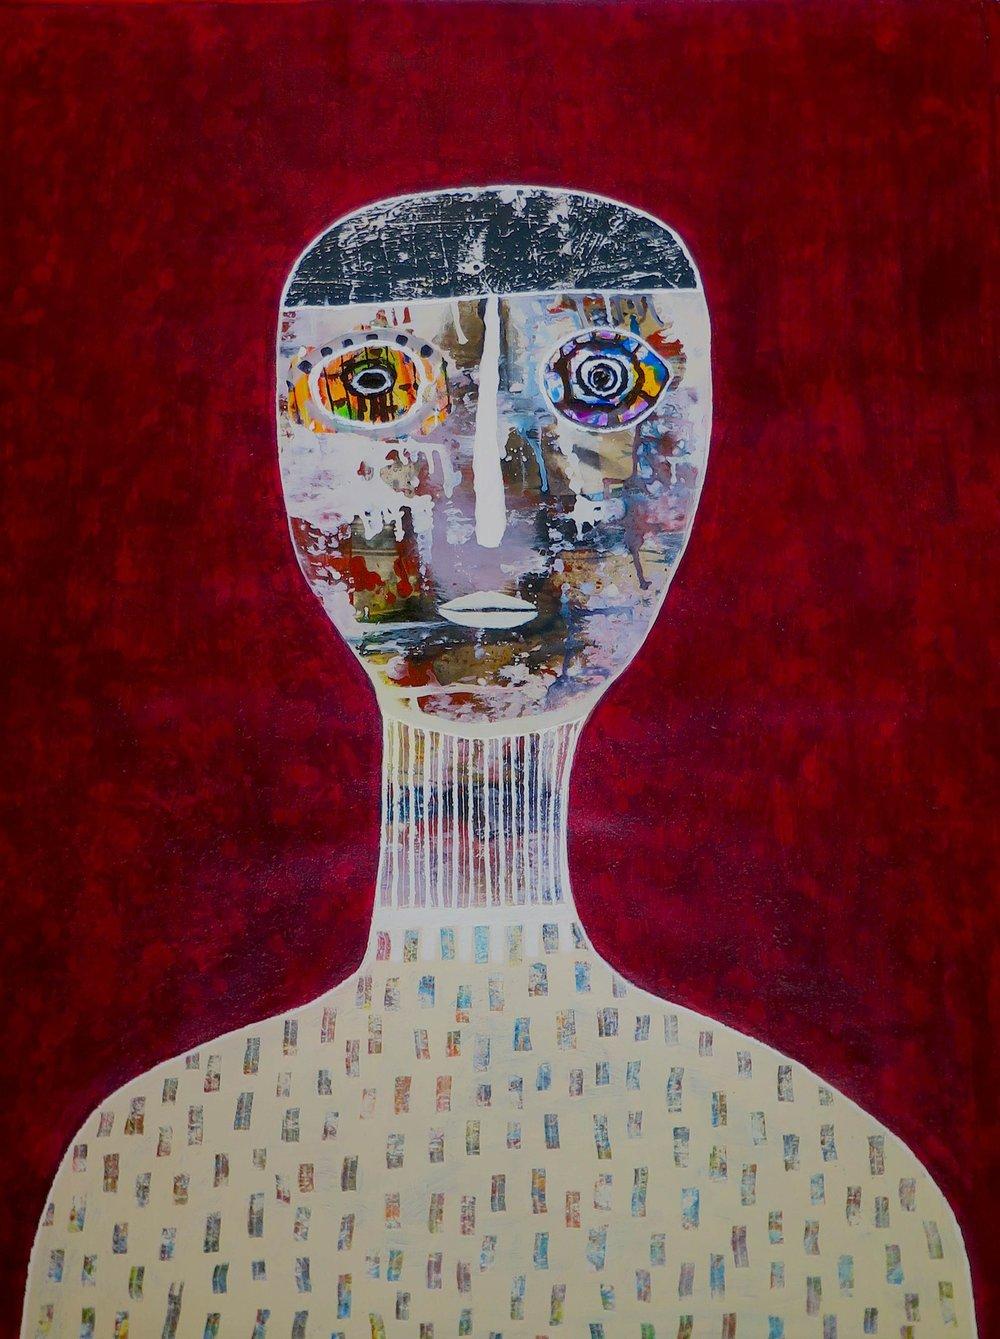 bryant-toth-fine-art-hector-frank-exhibition-10.jpg